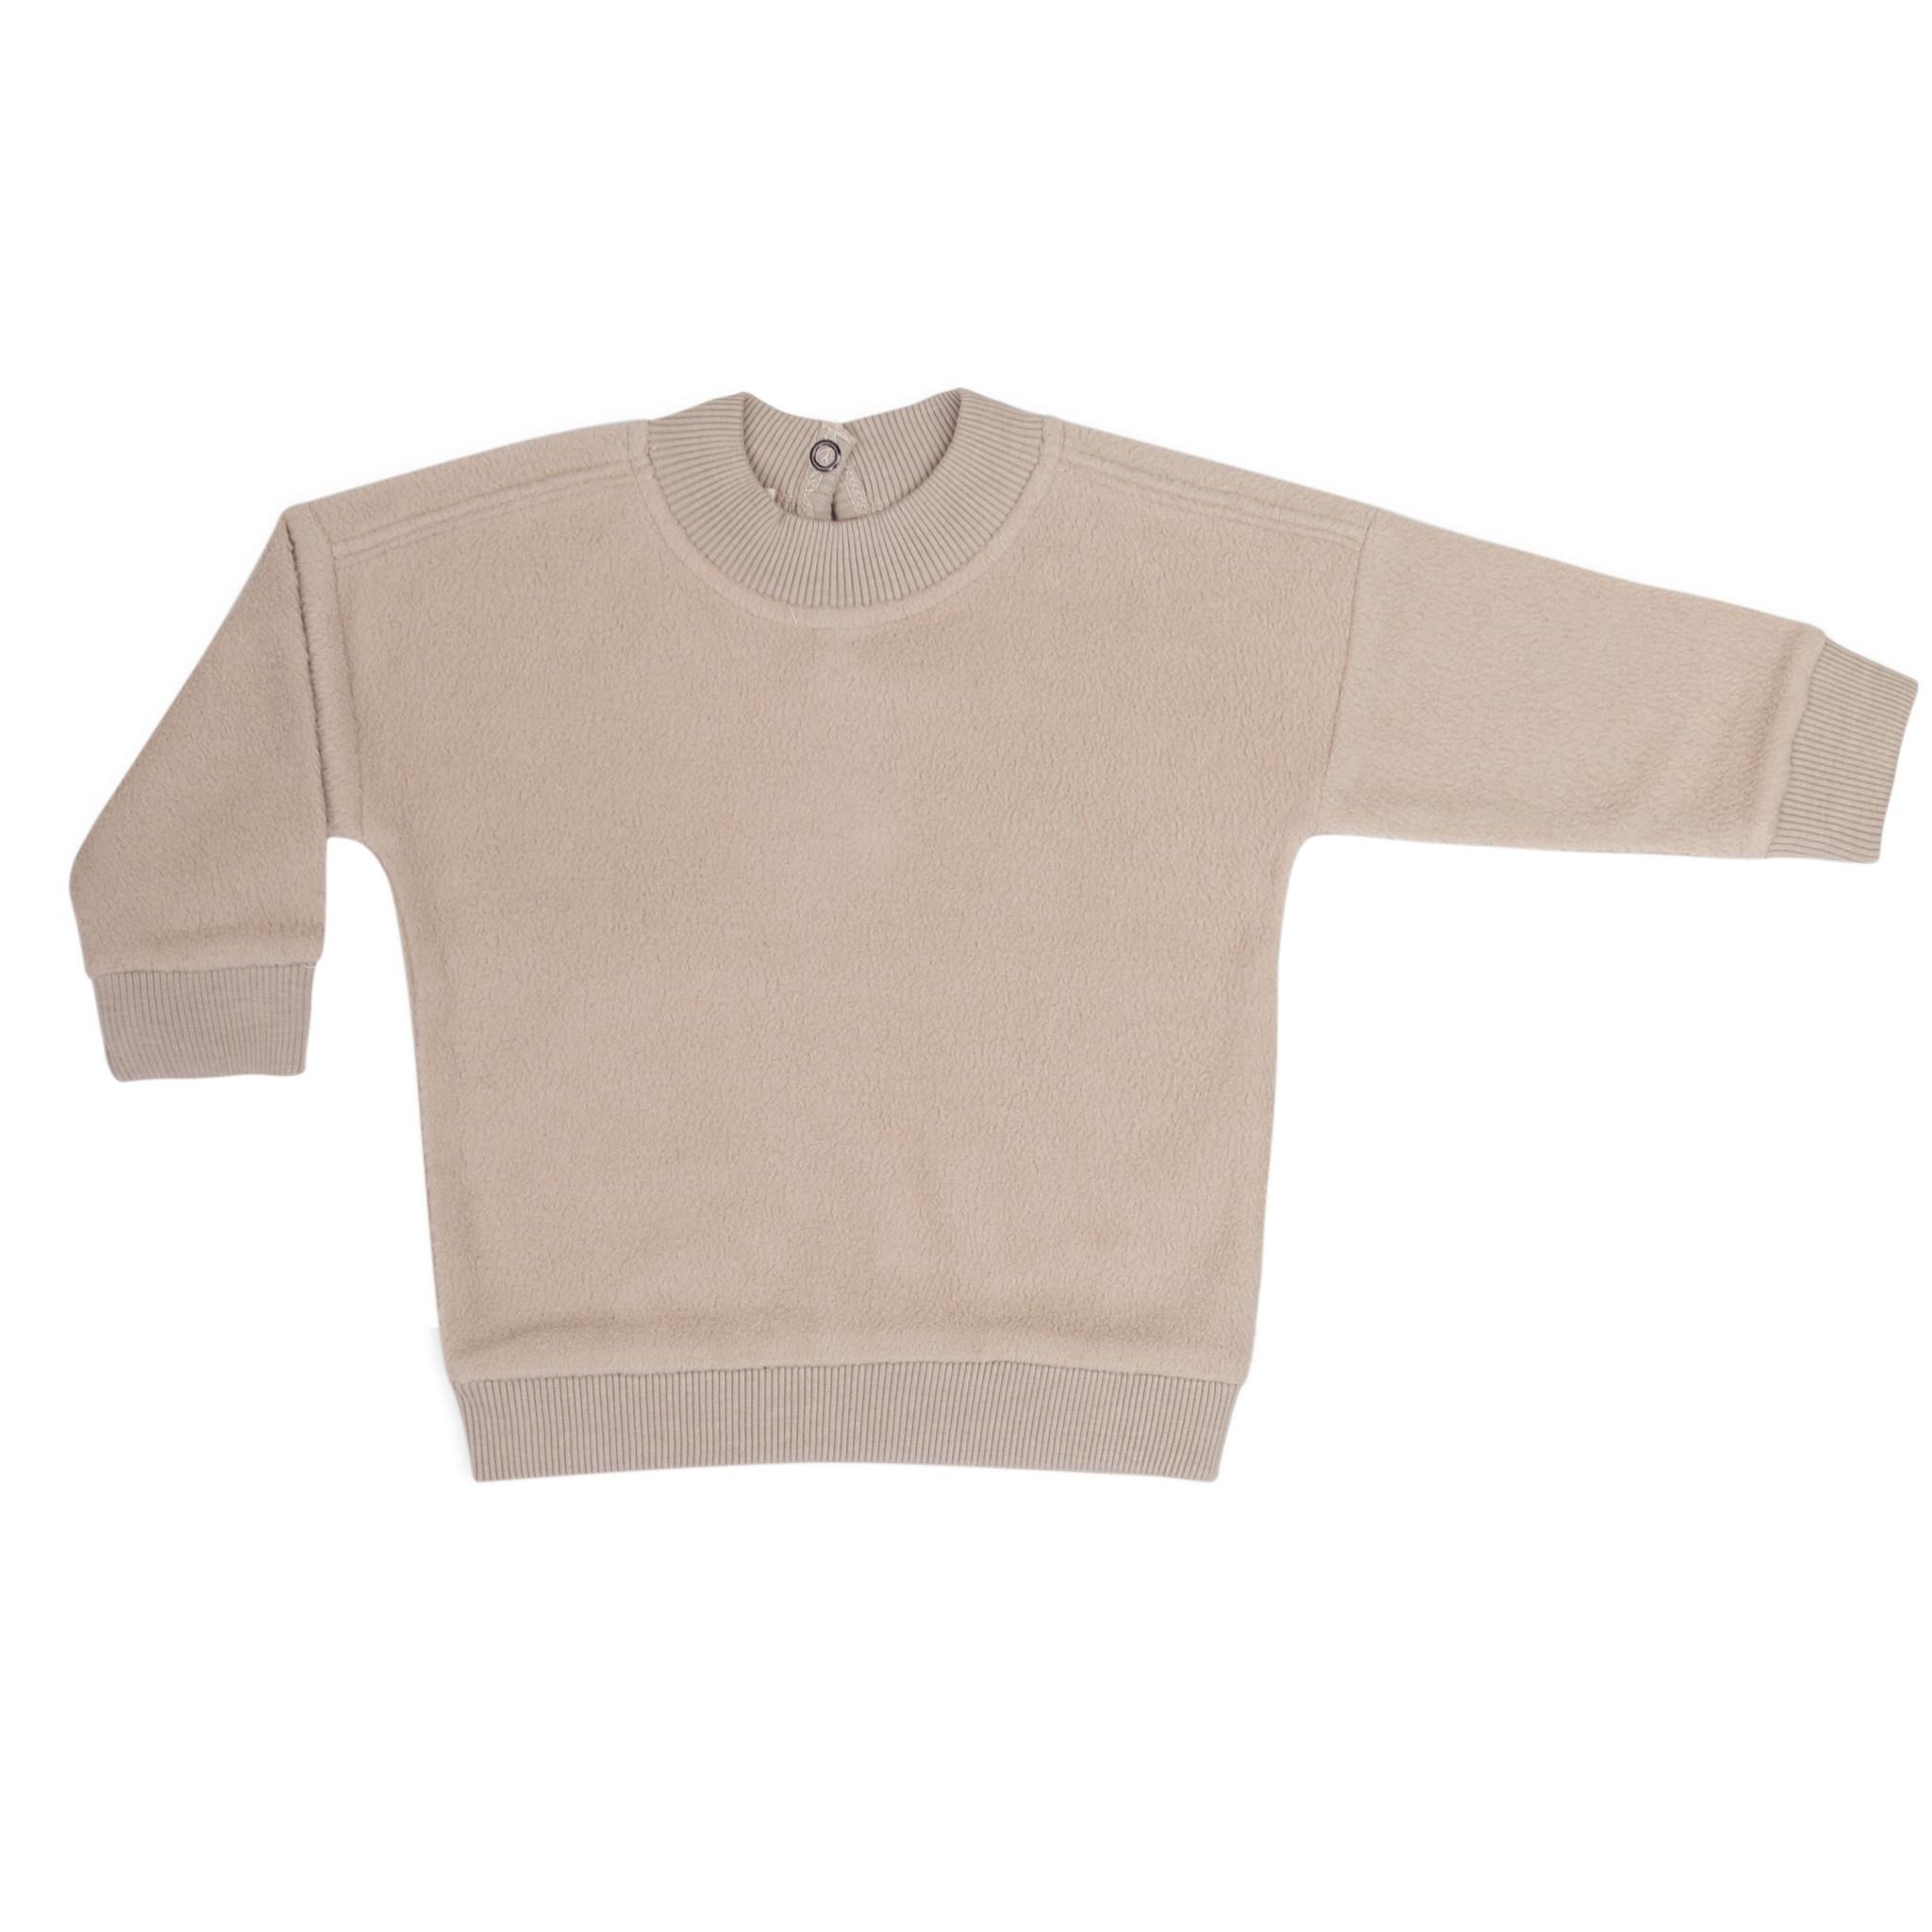 Phil&Phae Phil&phae - Teddy baby sweater straw